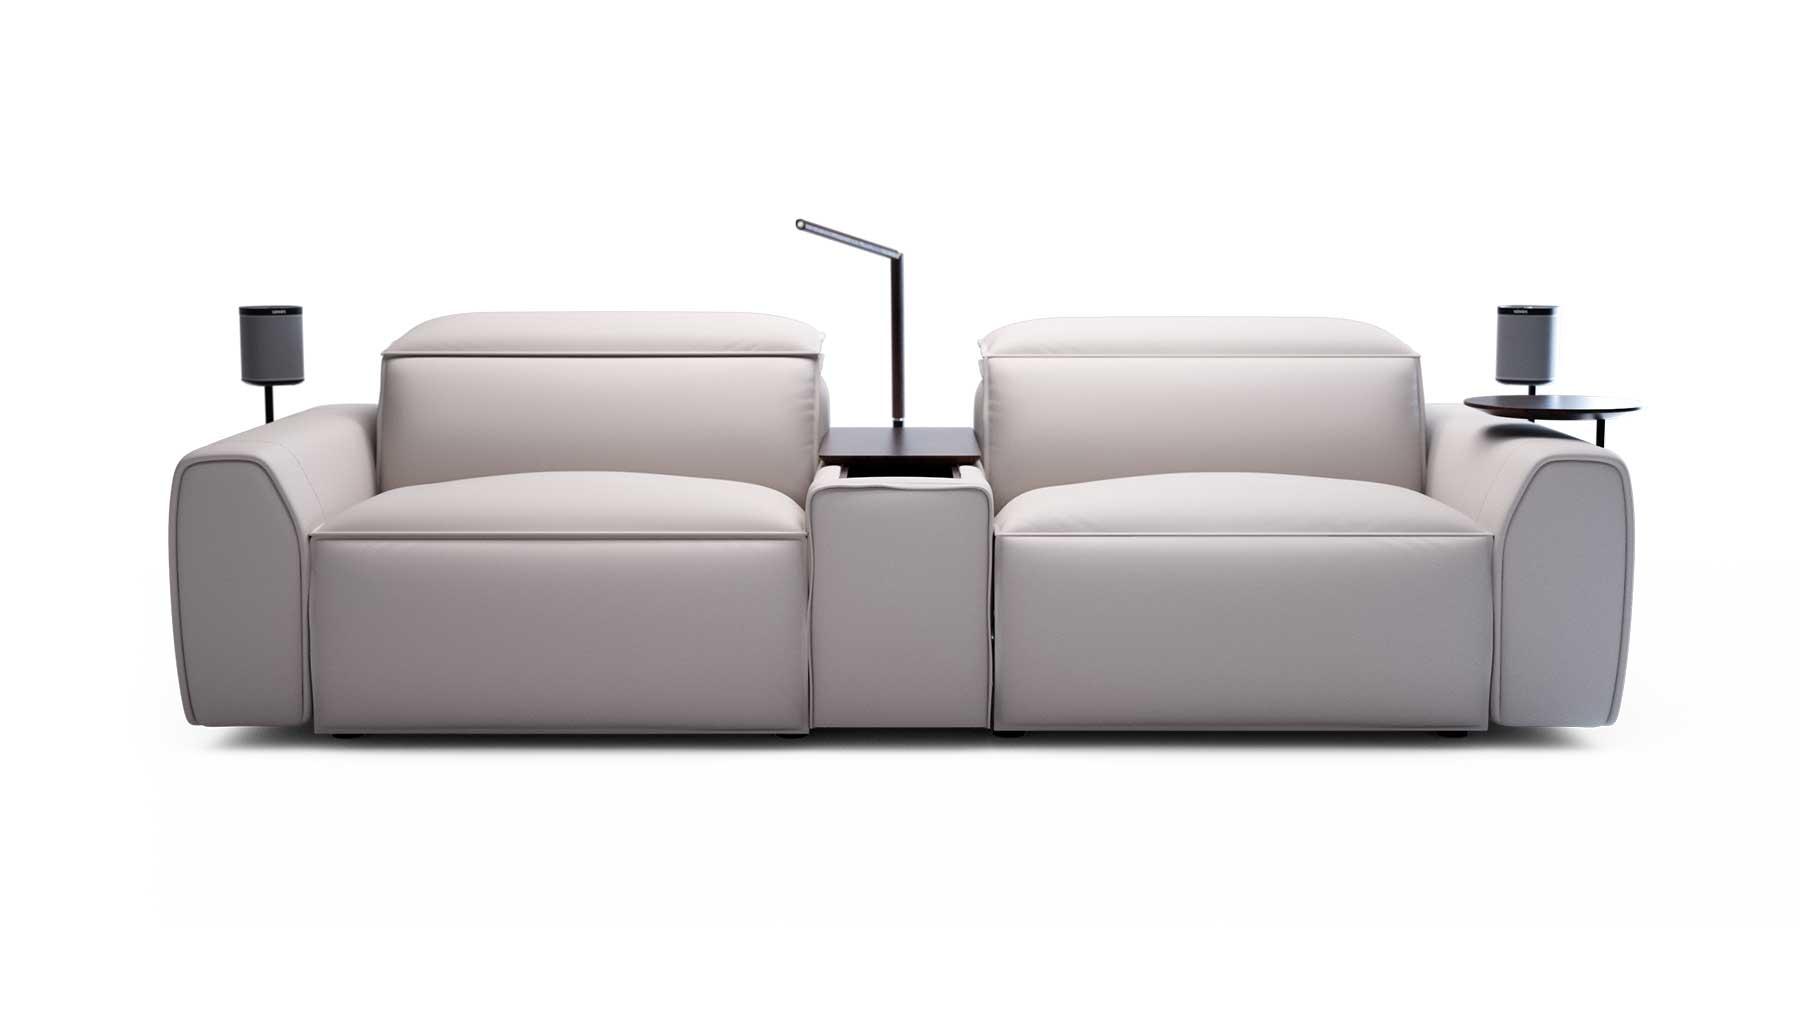 Awe Inspiring Nimbus Reclining Sofa Luxurious Recliner Modular Sofa Lounge Evergreenethics Interior Chair Design Evergreenethicsorg